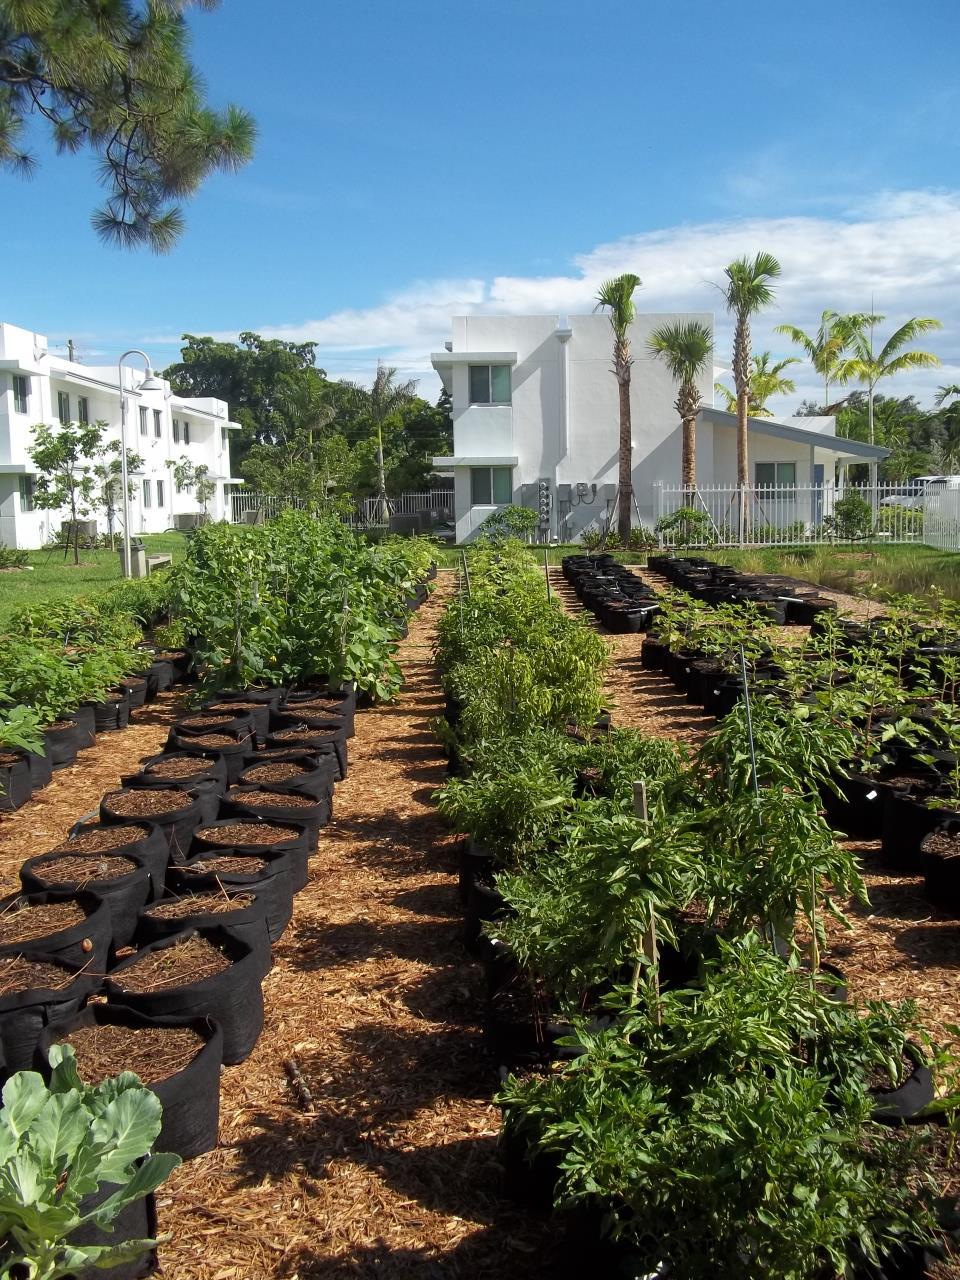 NW Gardens community garden